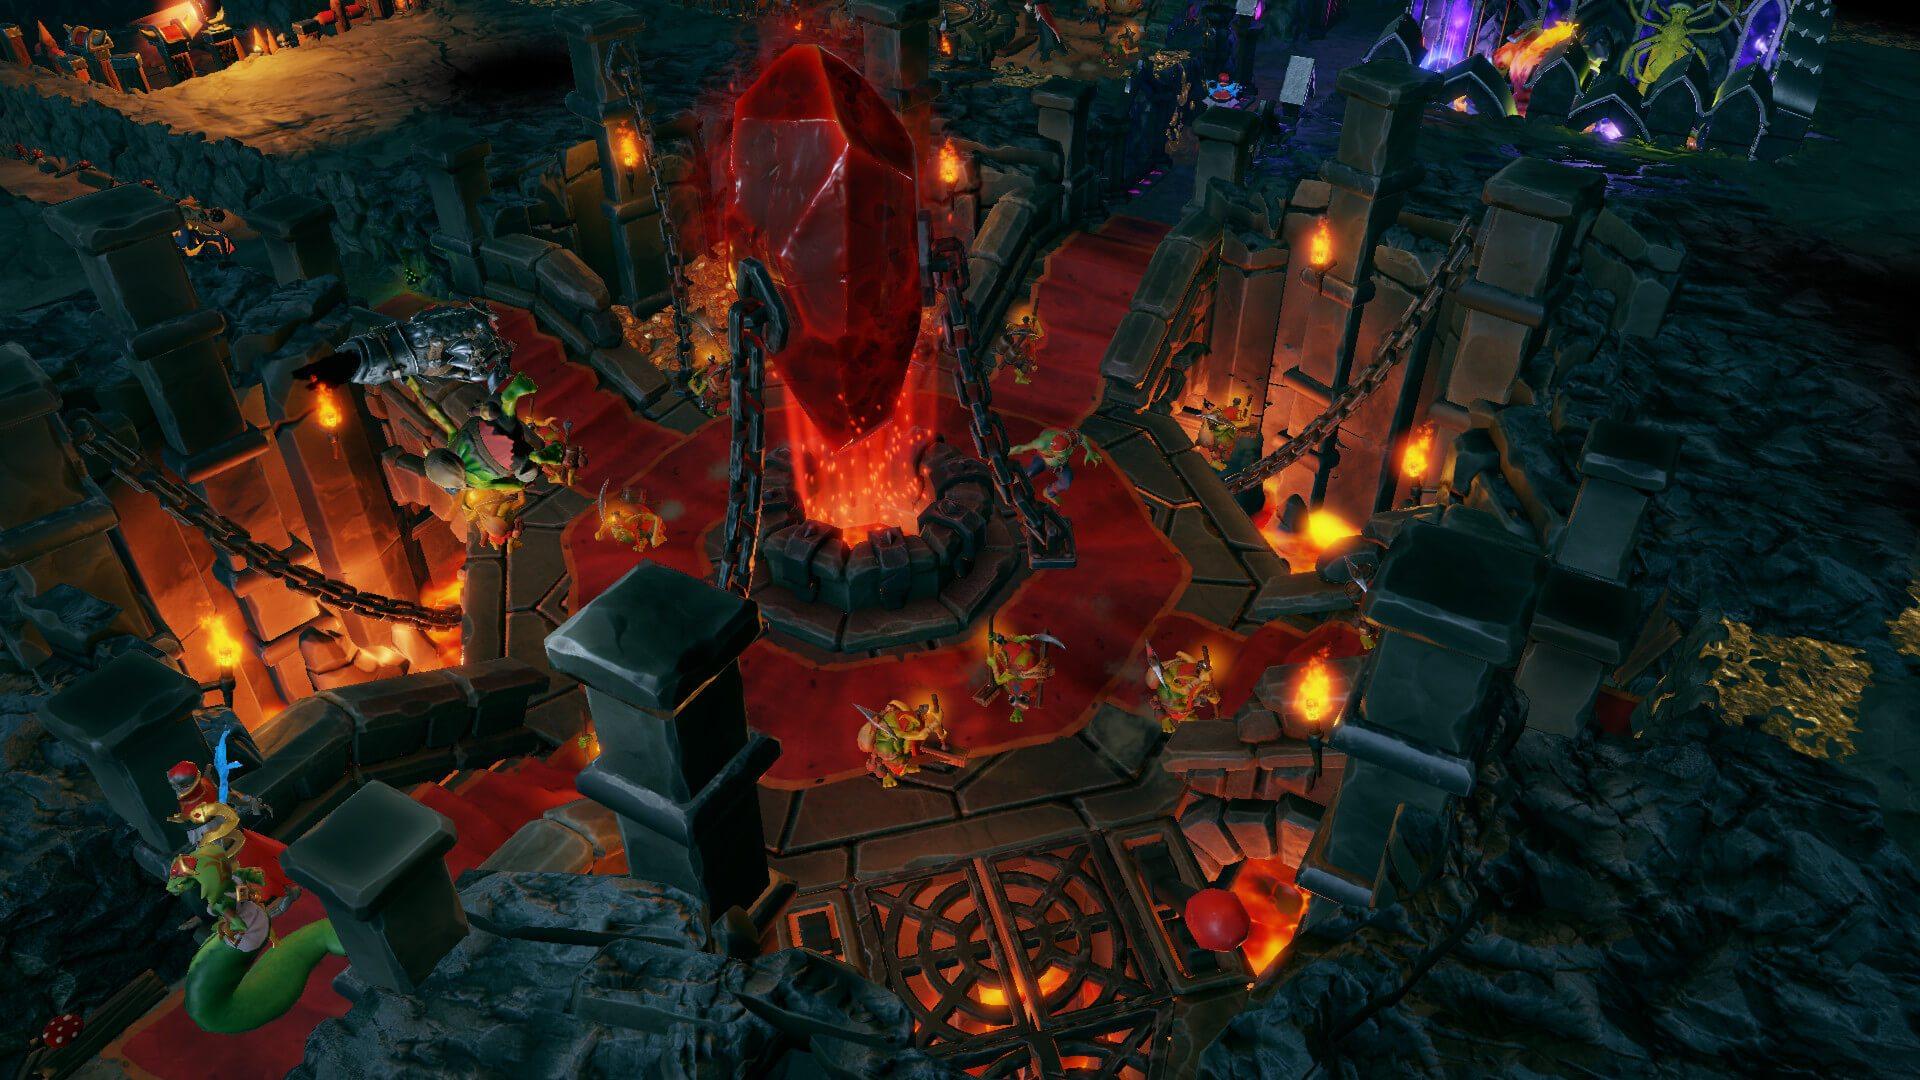 Descargar Imagenes Gratis: Descargar Dungeons 3 Para PC Gratis